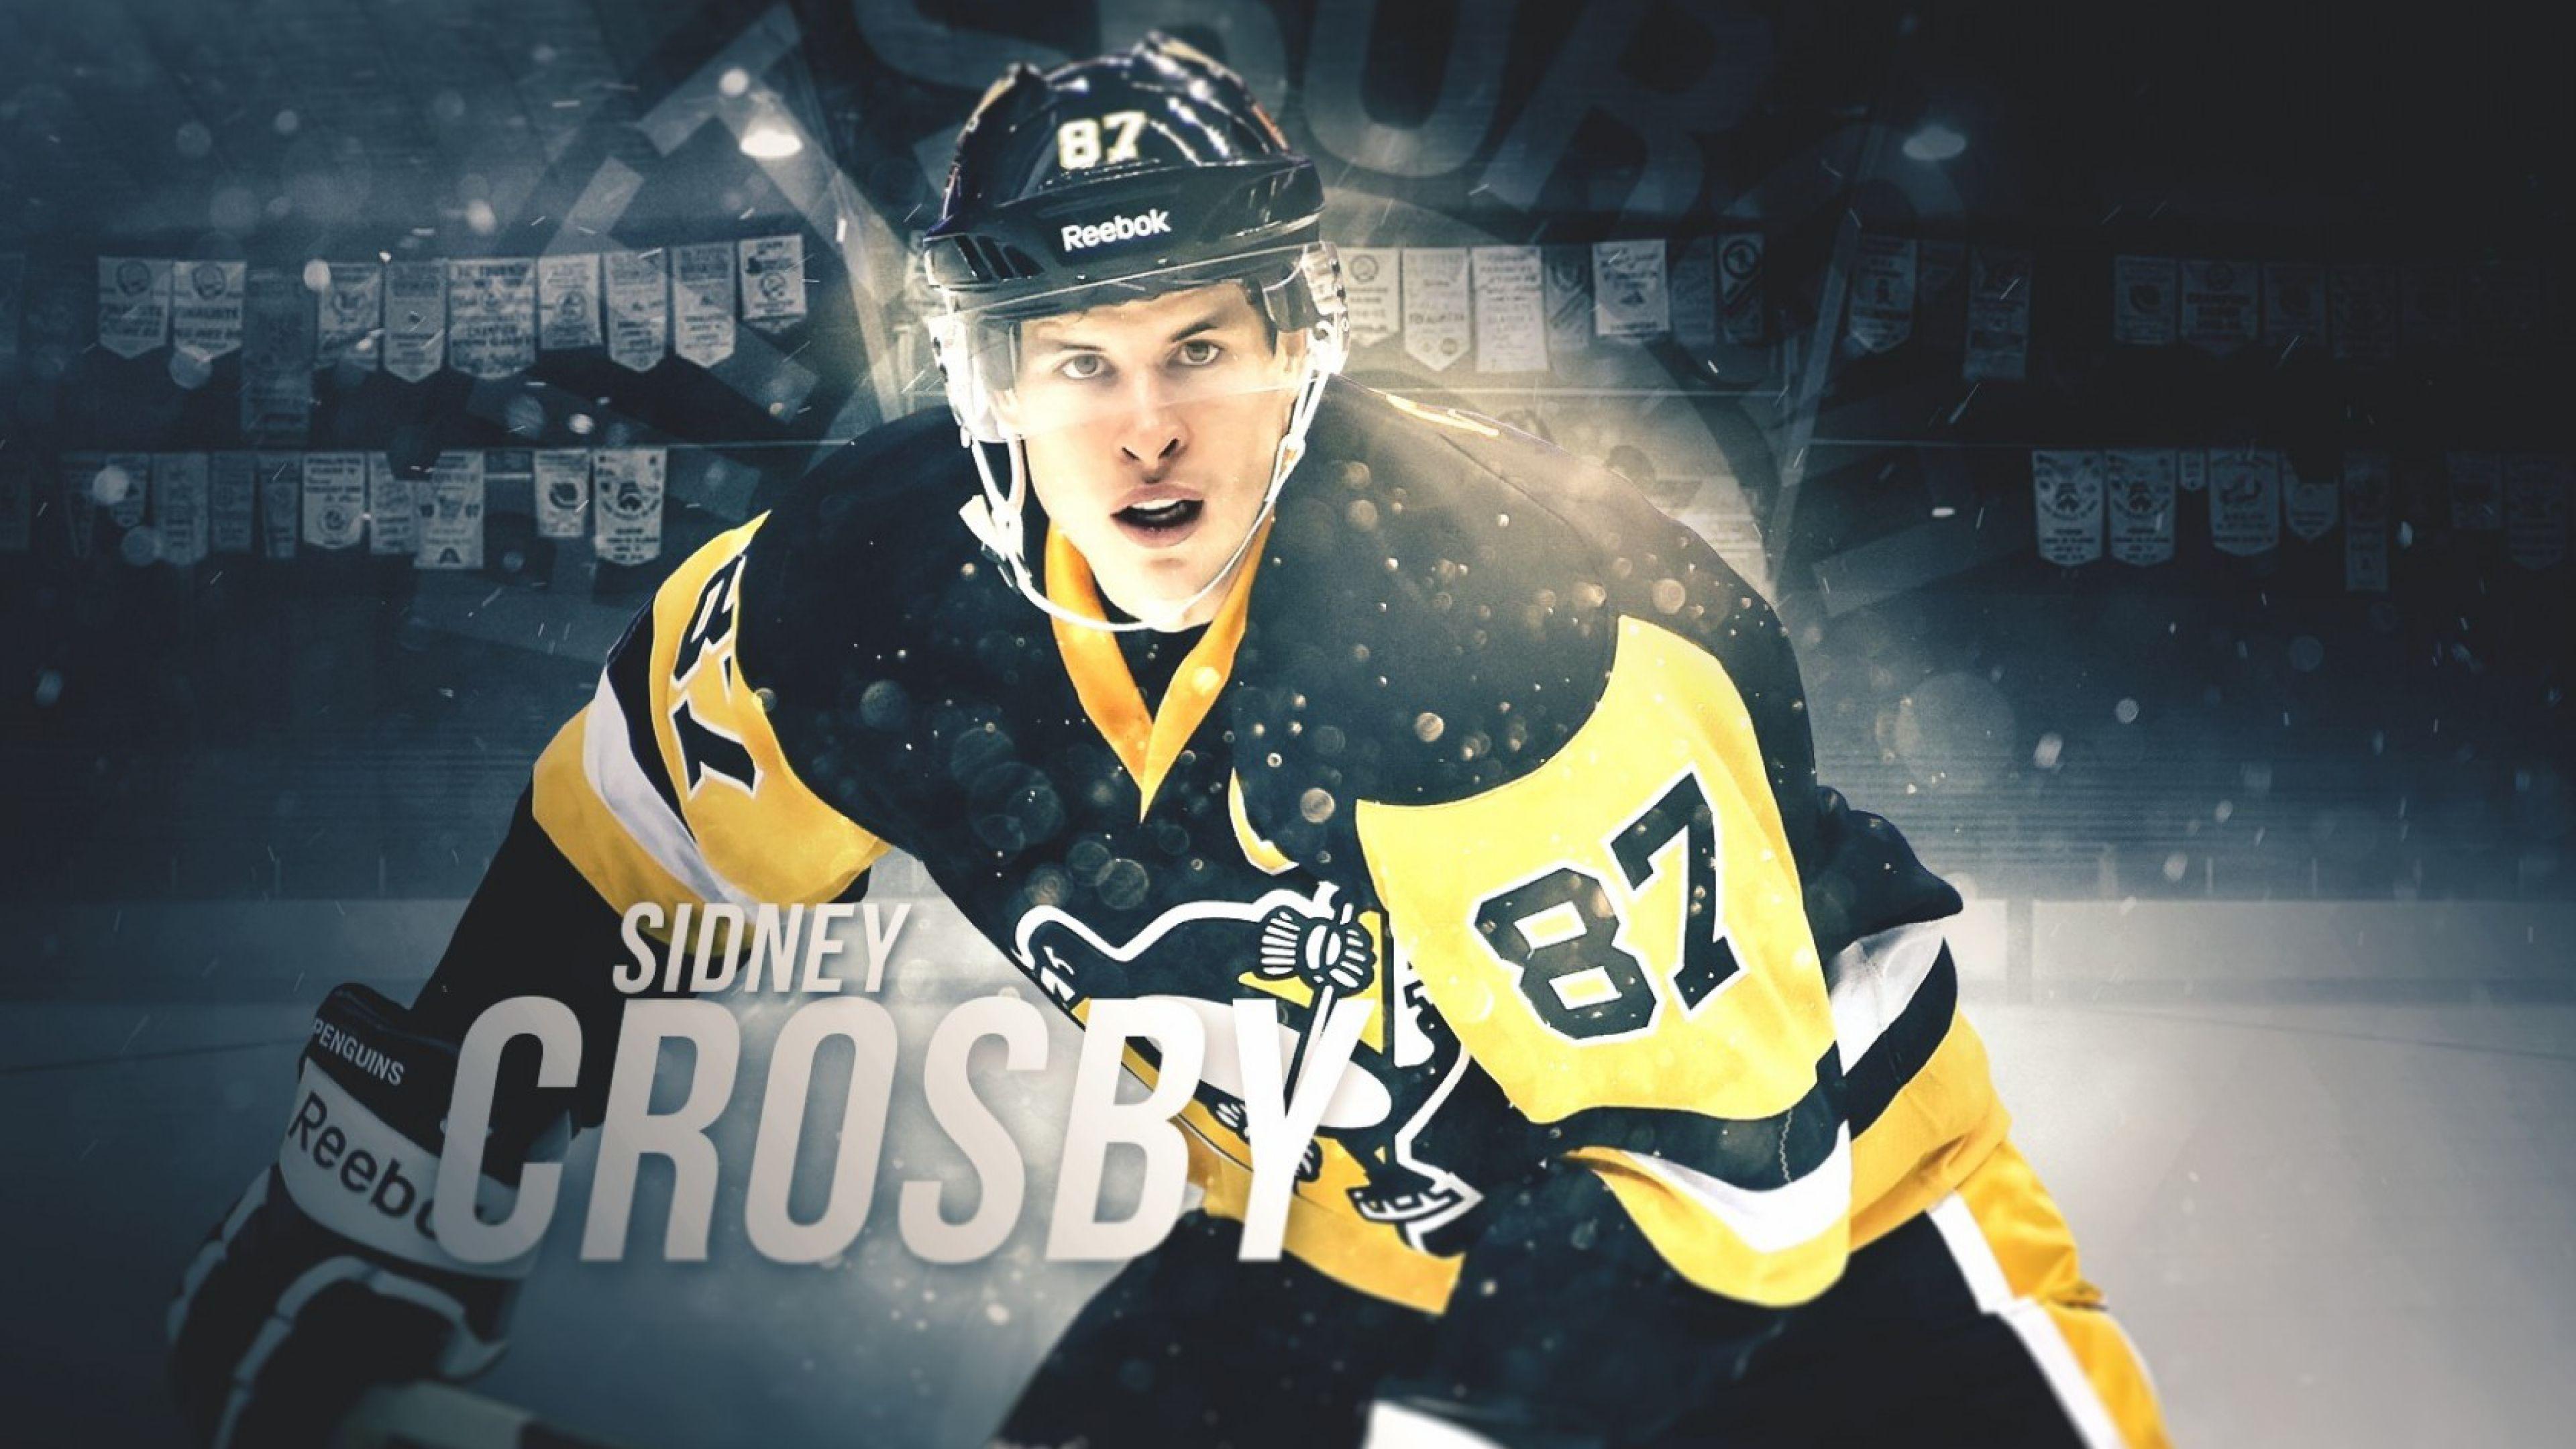 Pittsburgh Penguins Wallpapers, Widescreen Pics